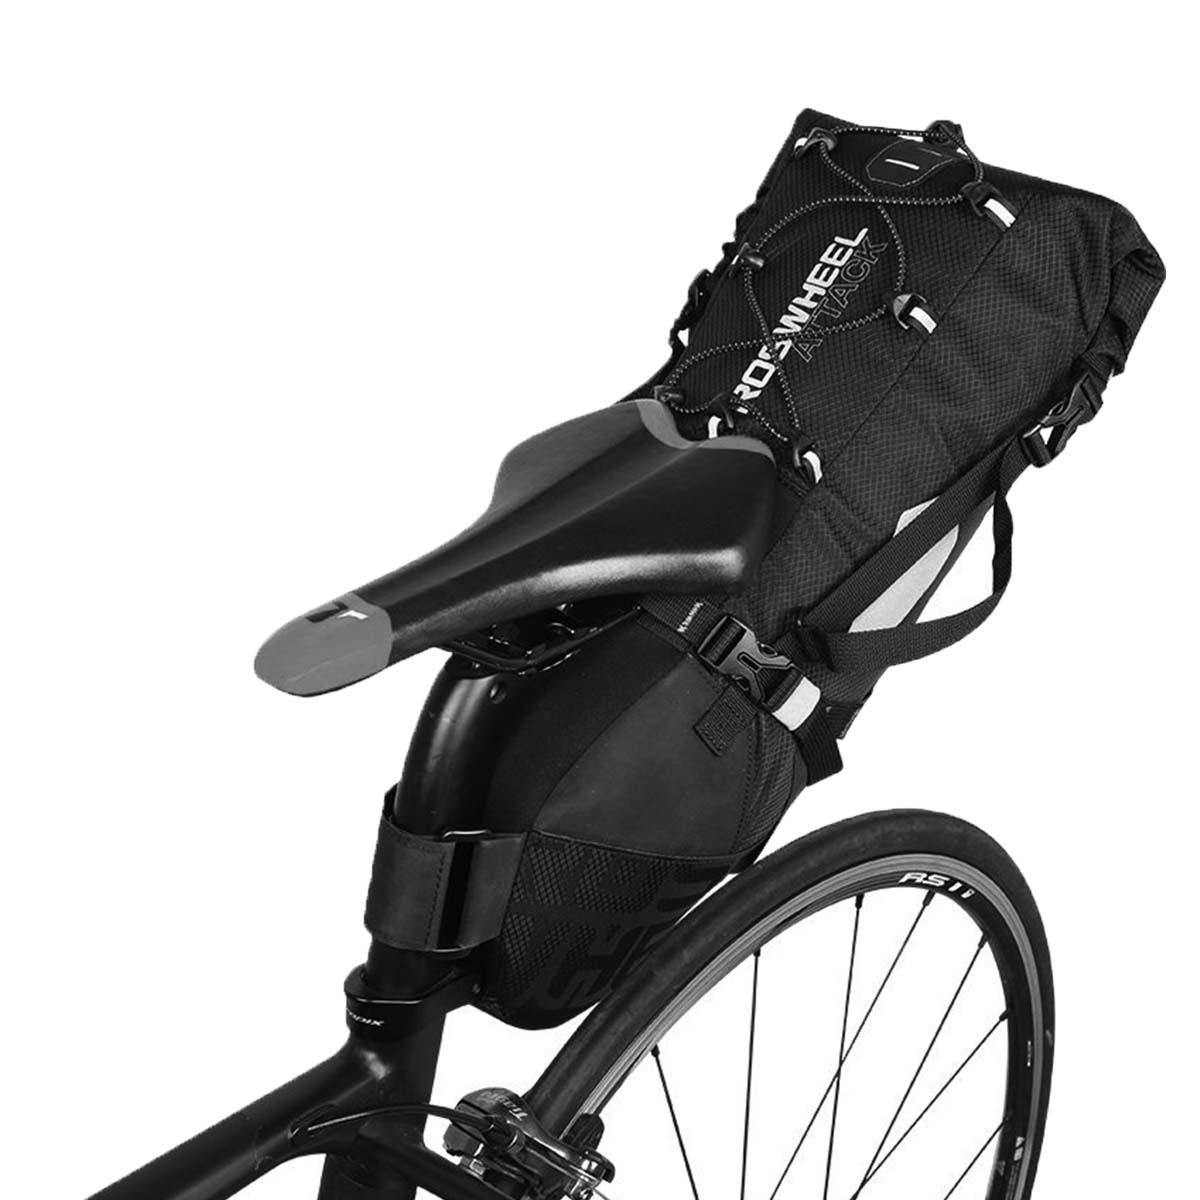 Bolsa Selim À Prova D'água Ciclismo Bicicleta Roswheel Preto